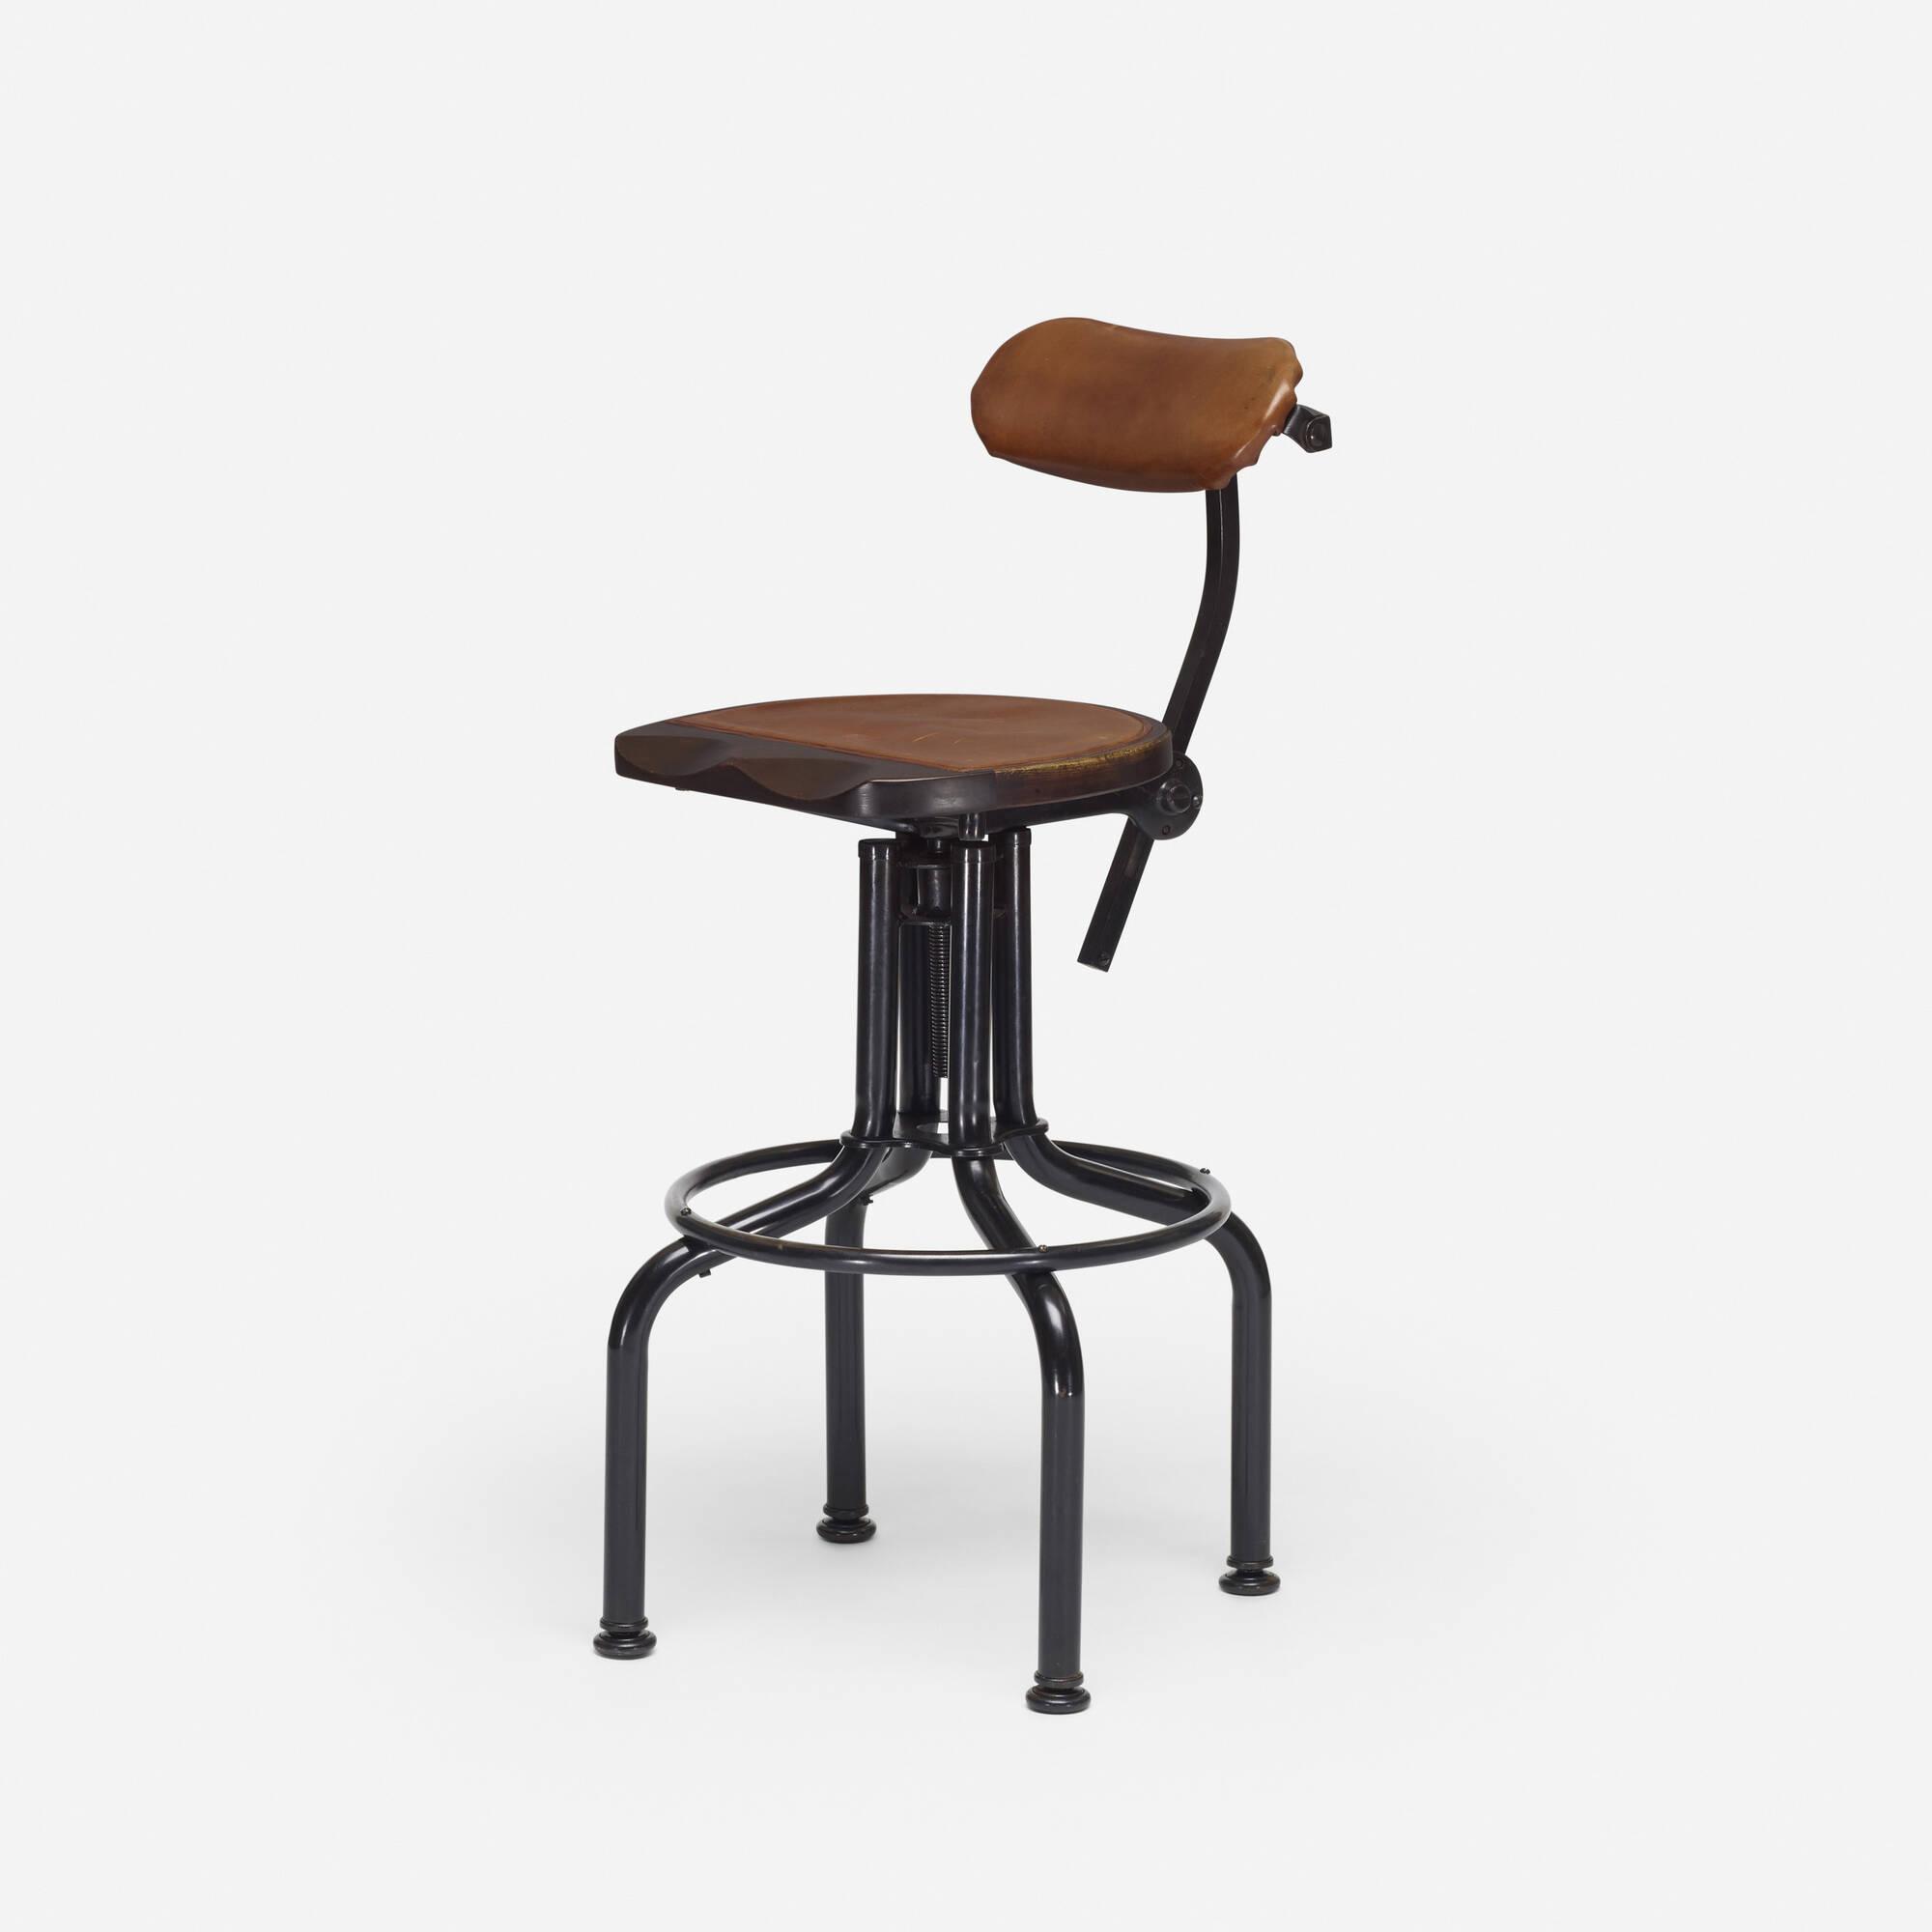 125: American / swivel stool (1 of 1)